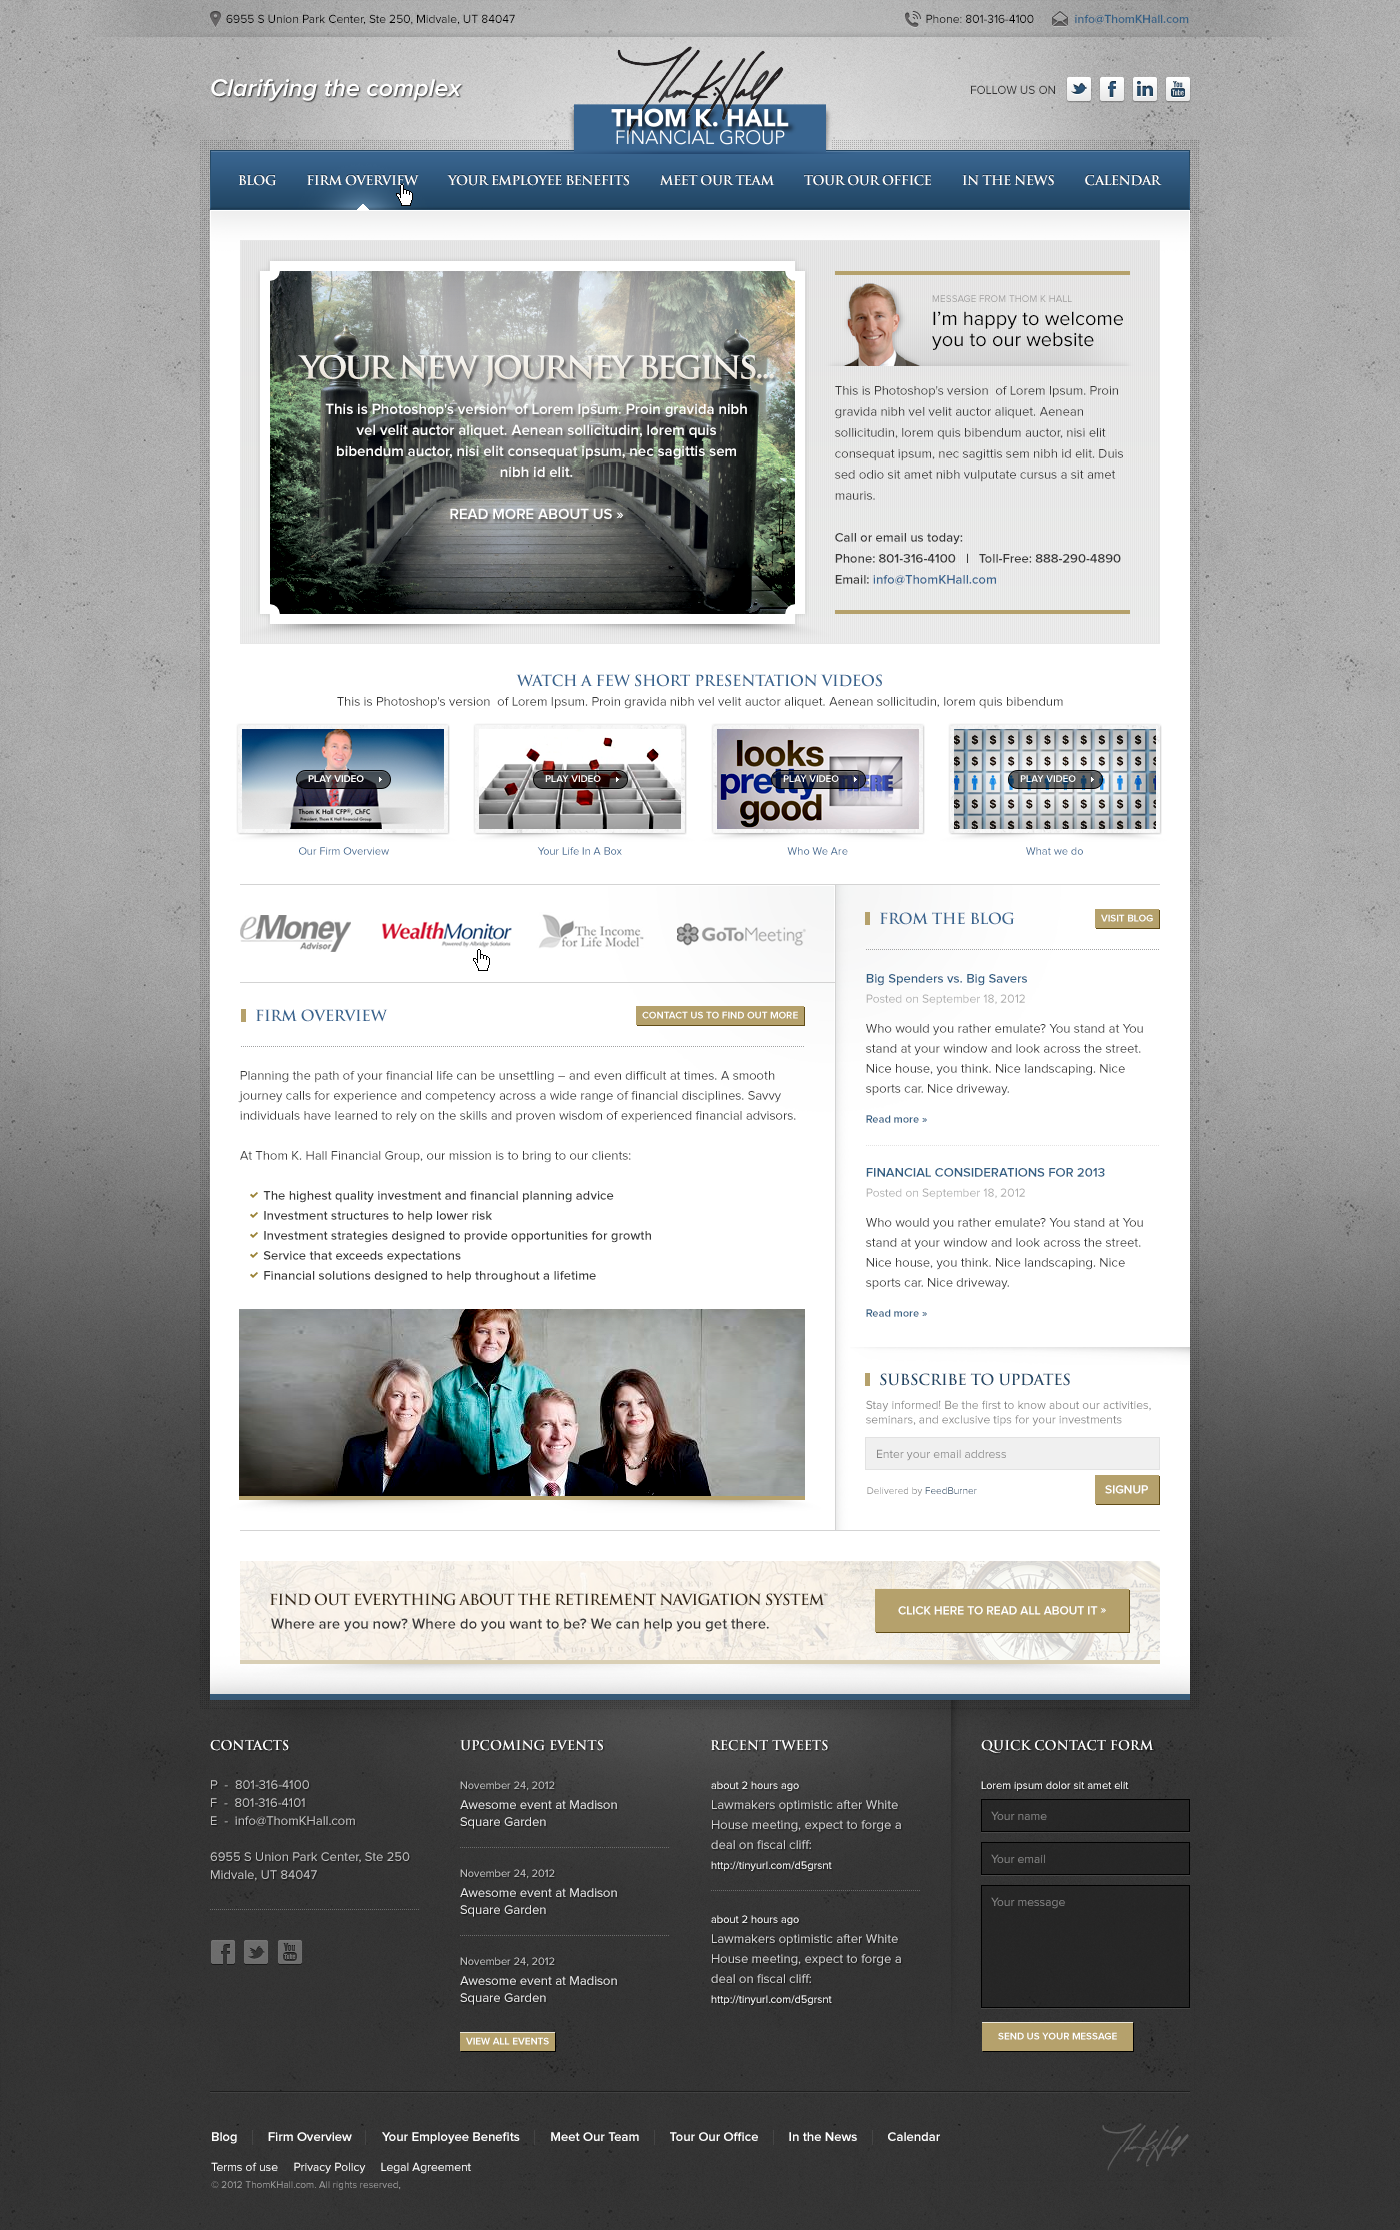 Thom K. Hall Financial Group needs a new website design